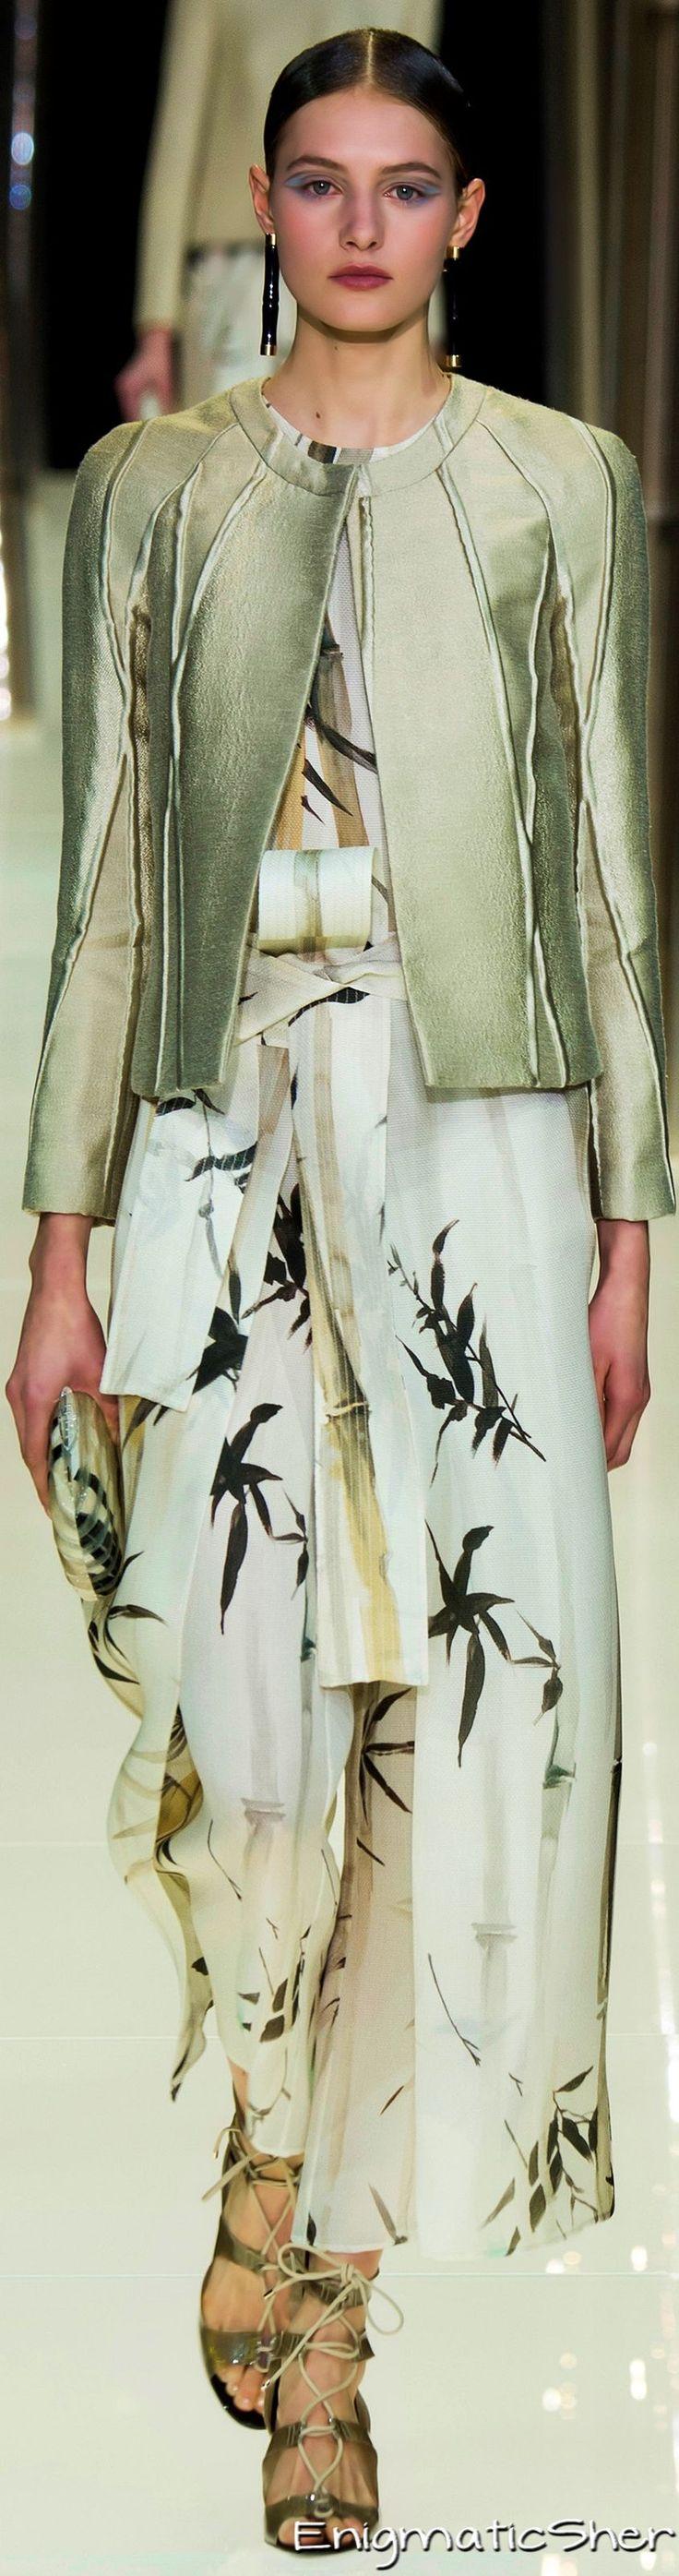 Giorgio Armani Privé Haute Couture Spring Summer 2015 women fashion outfit clothing style apparel @roressclothes closet ideas